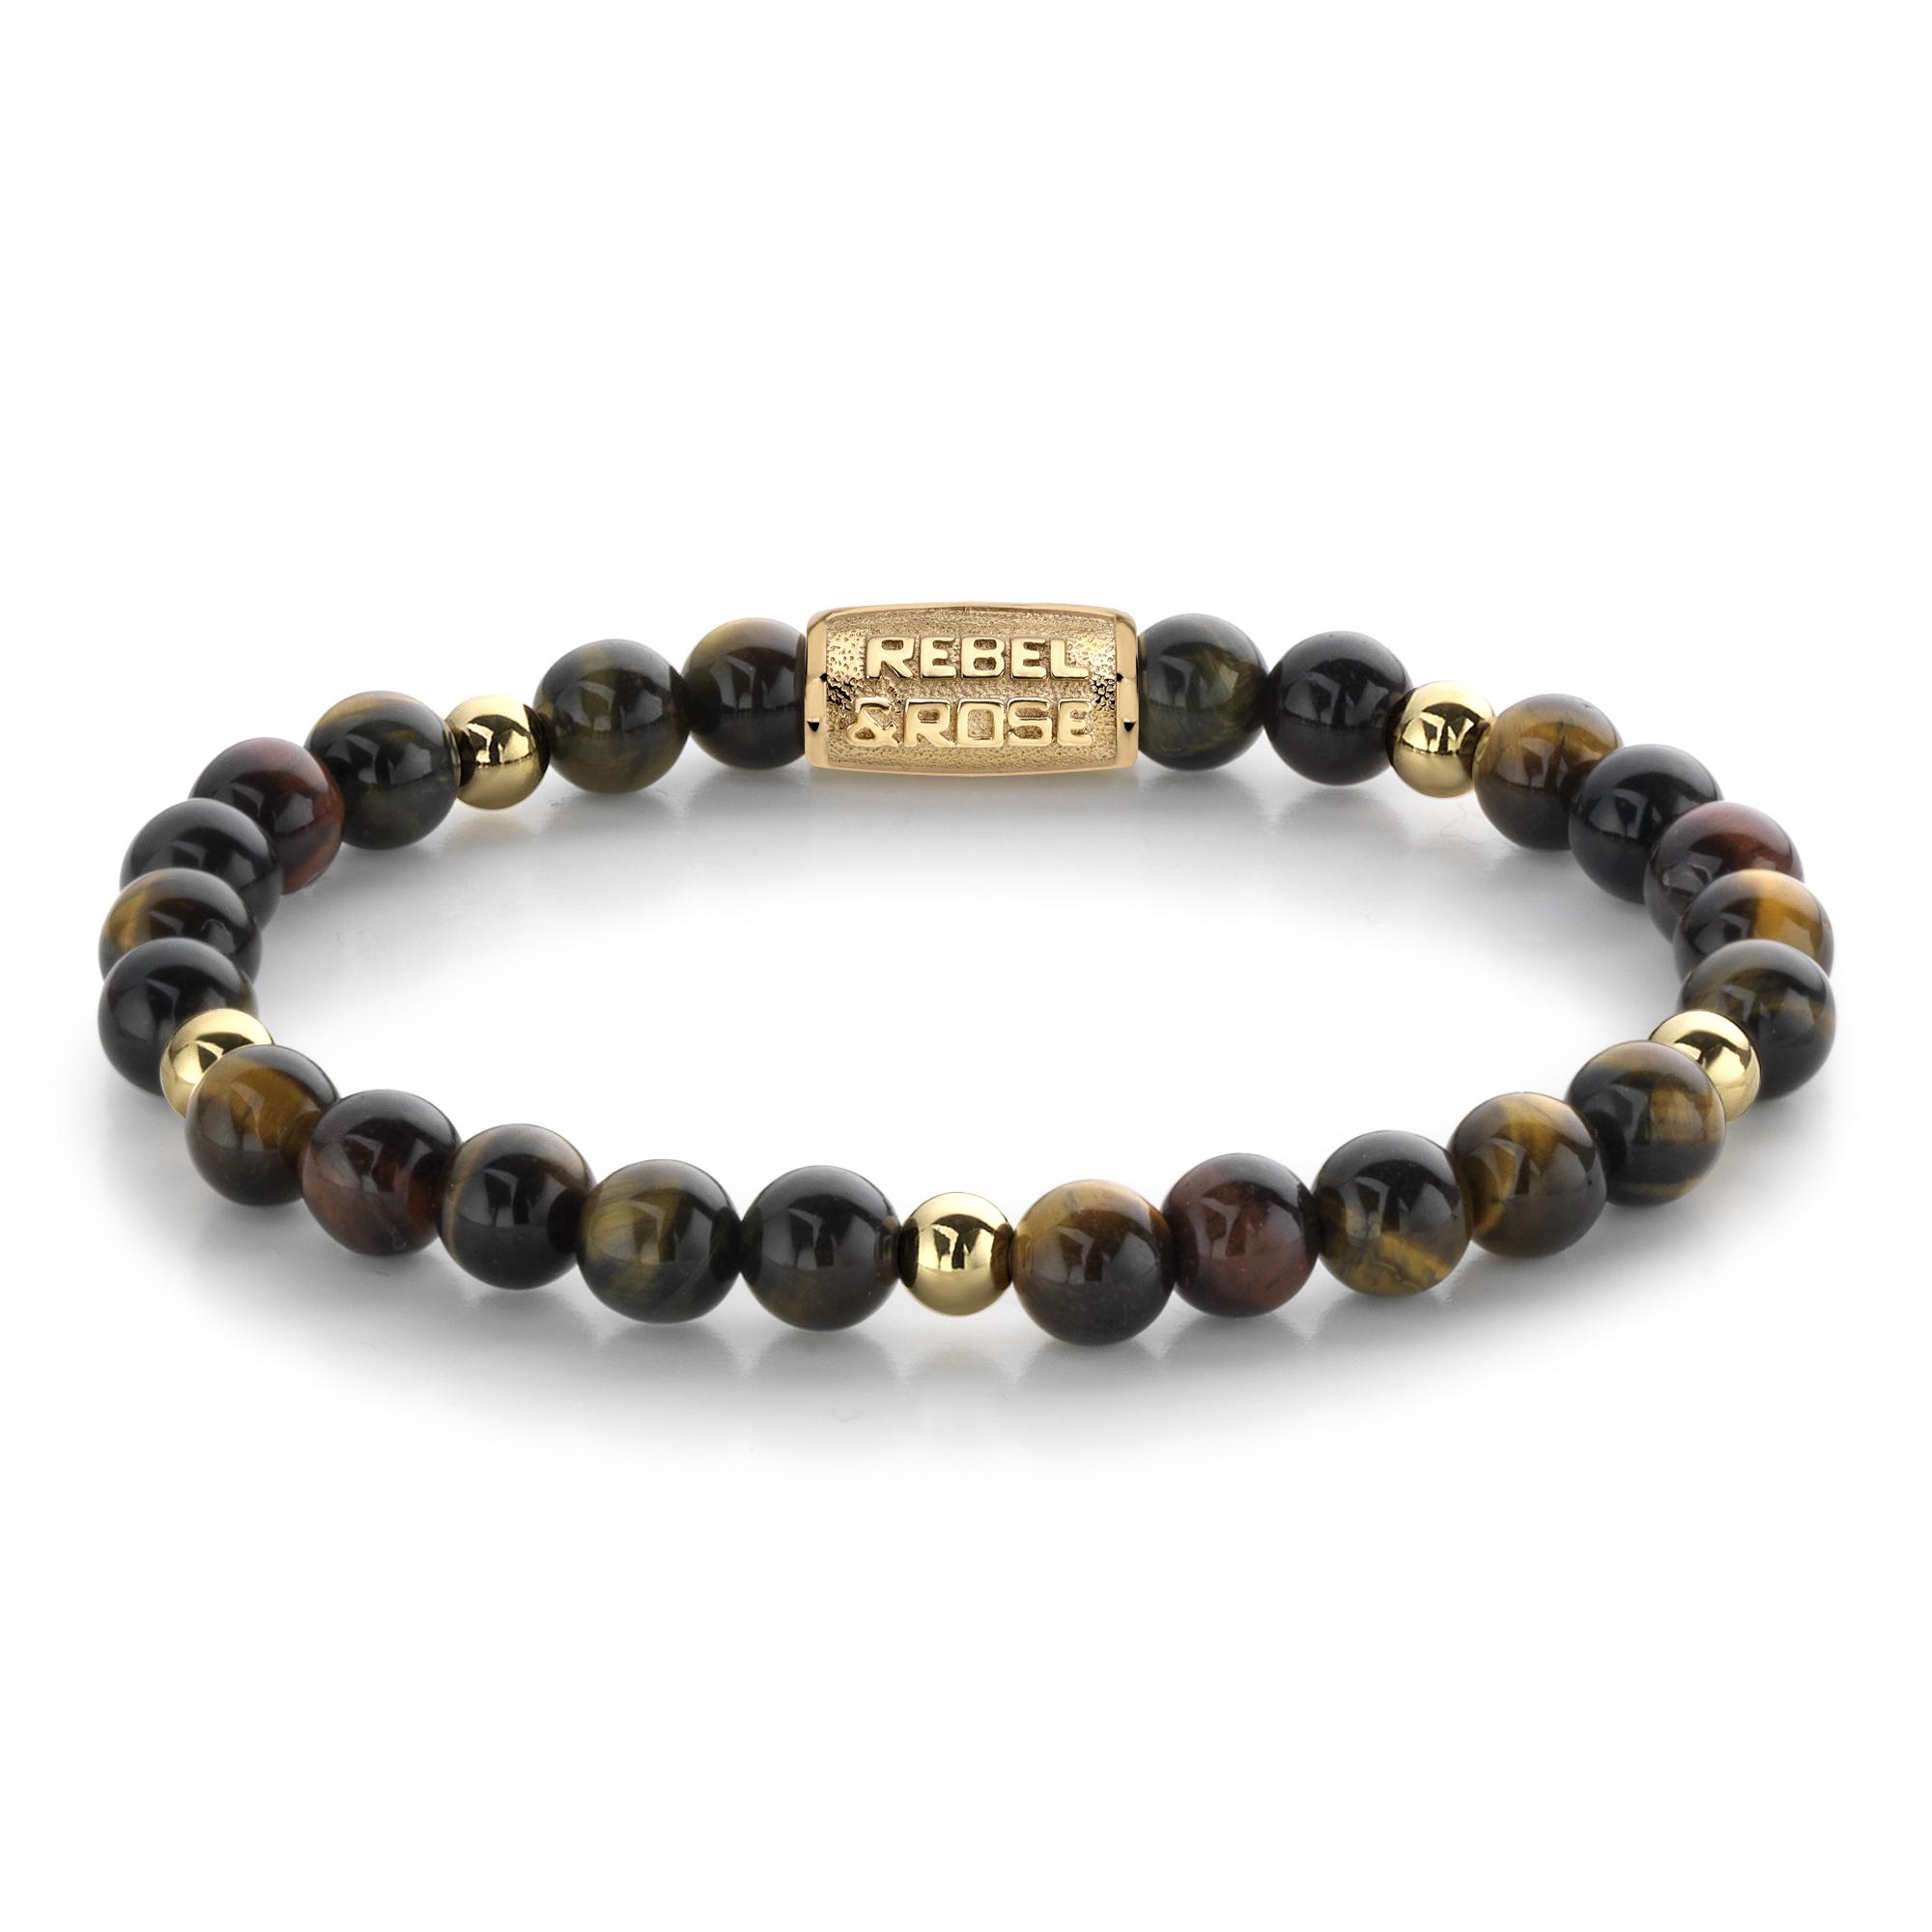 Rebel and Rose RR 60076 G Rekarmband Beads Who's afraid of the tiger II goudkleurig bruin 6 mm S 16,5 cm